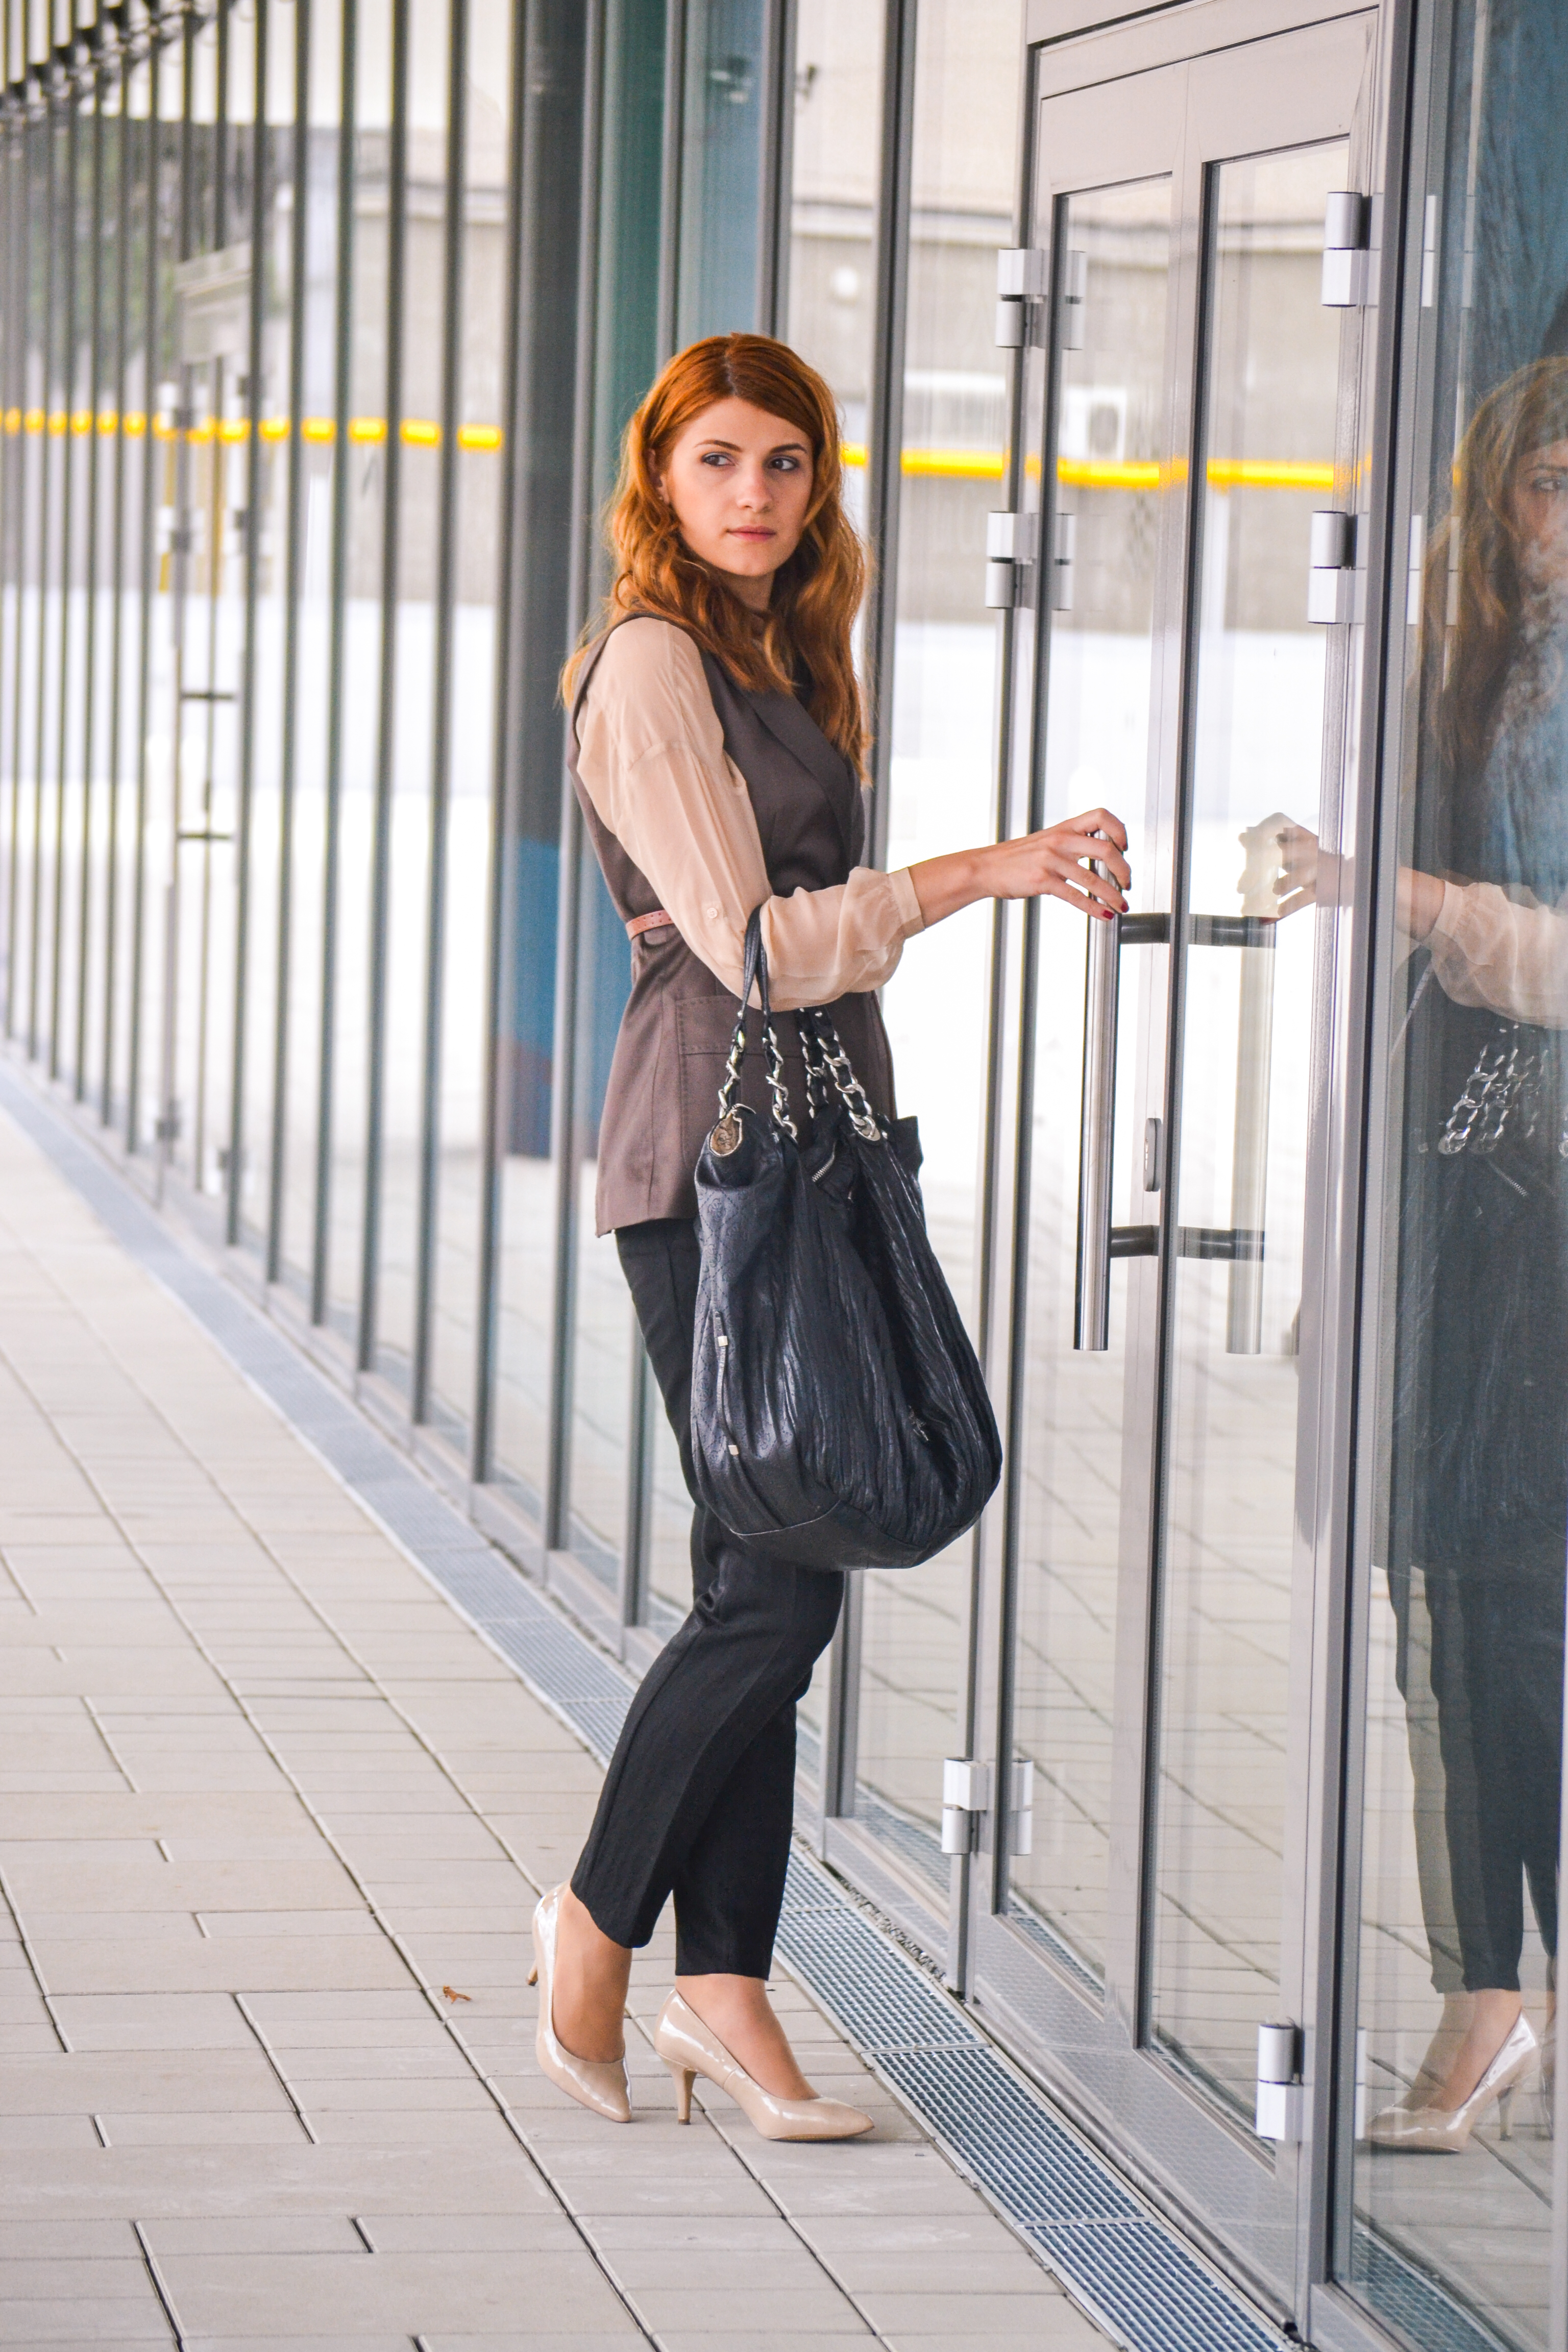 Woman Wearing Black Dress Pants With Black Handbag · Free ...